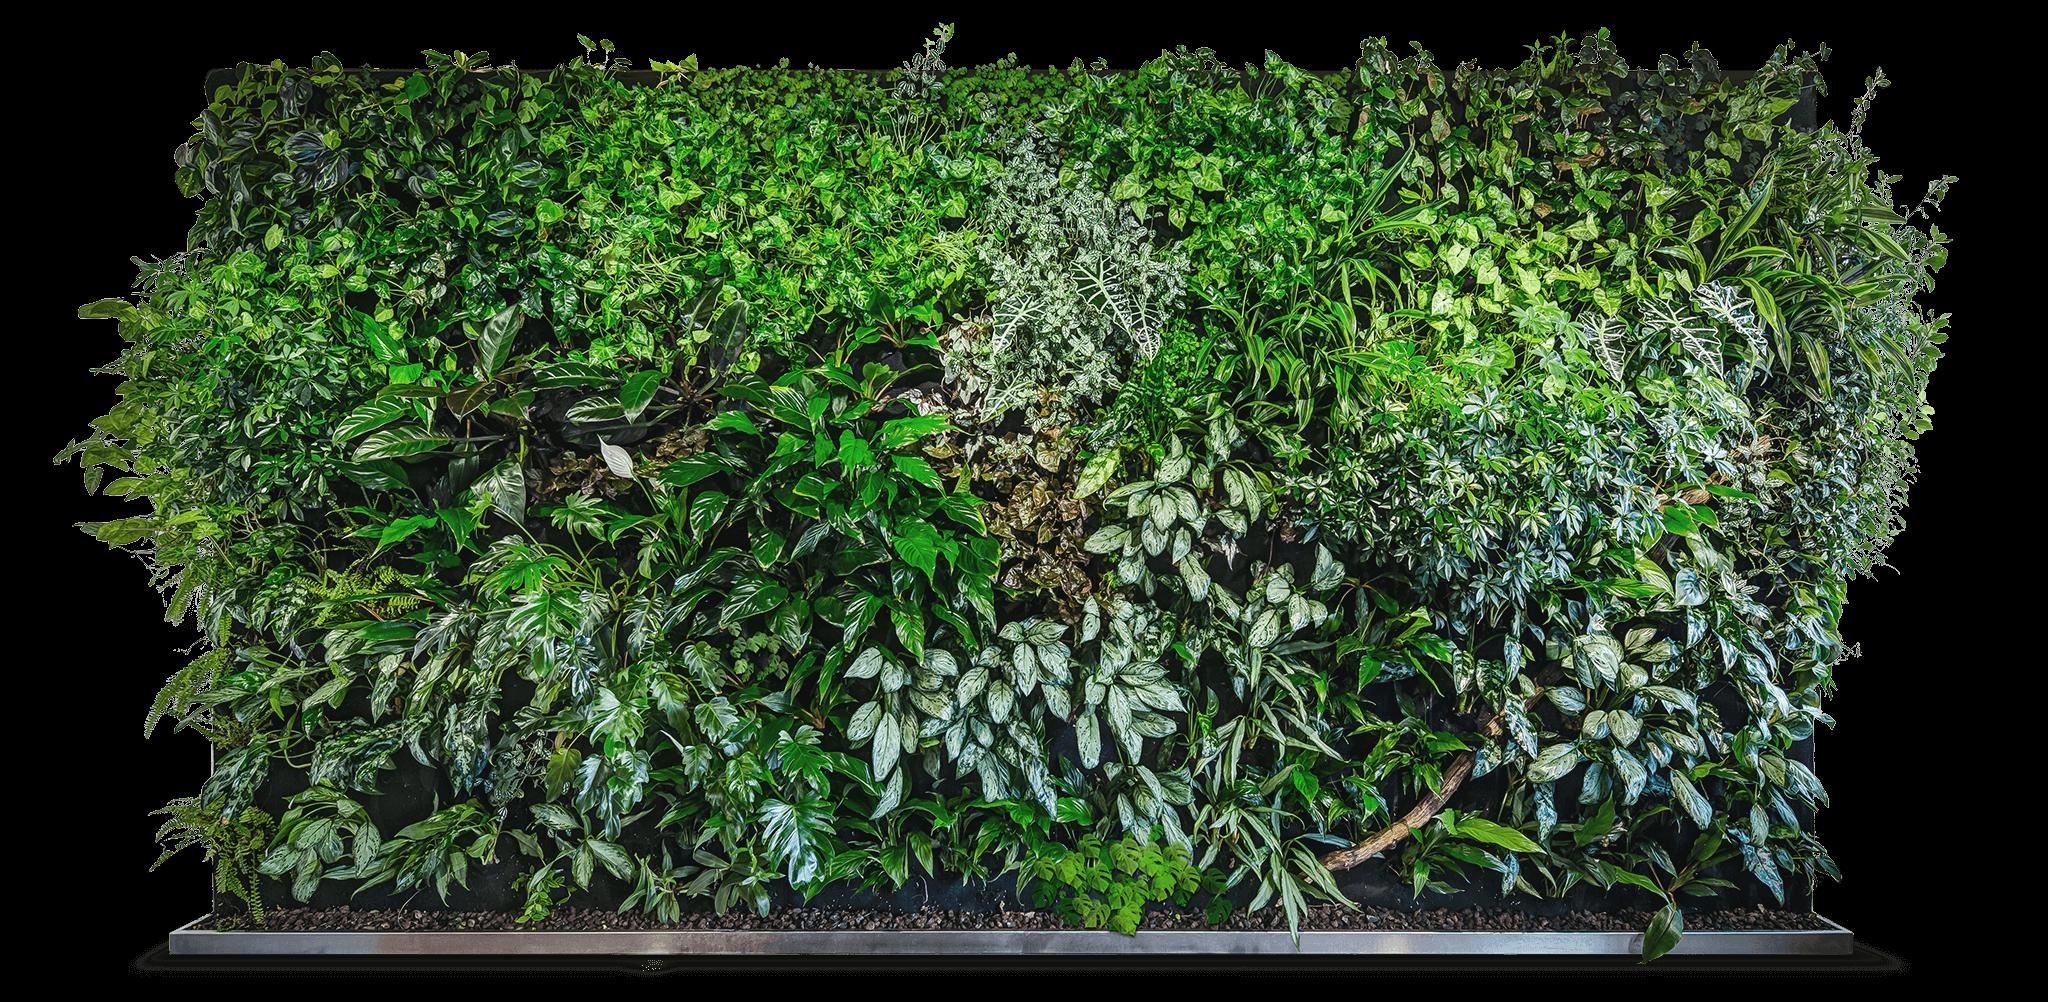 Bepflanzte Wand grüne wände florawall